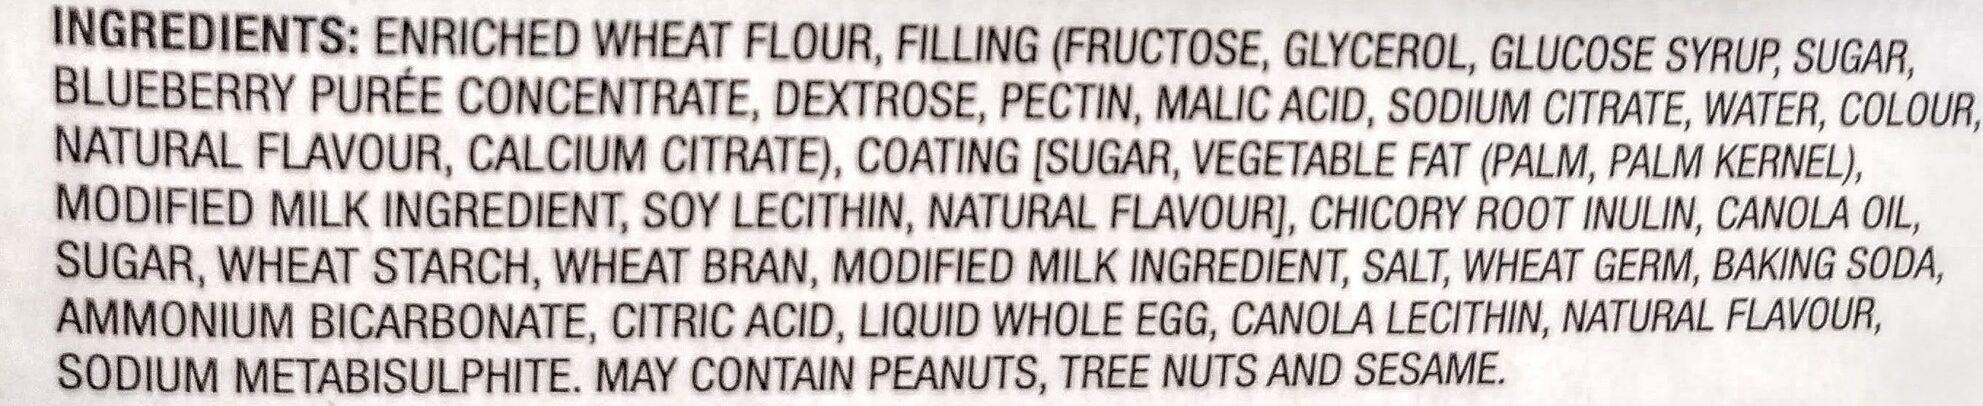 Crispy Snacks with Blueberry Filling - Ingredients - en